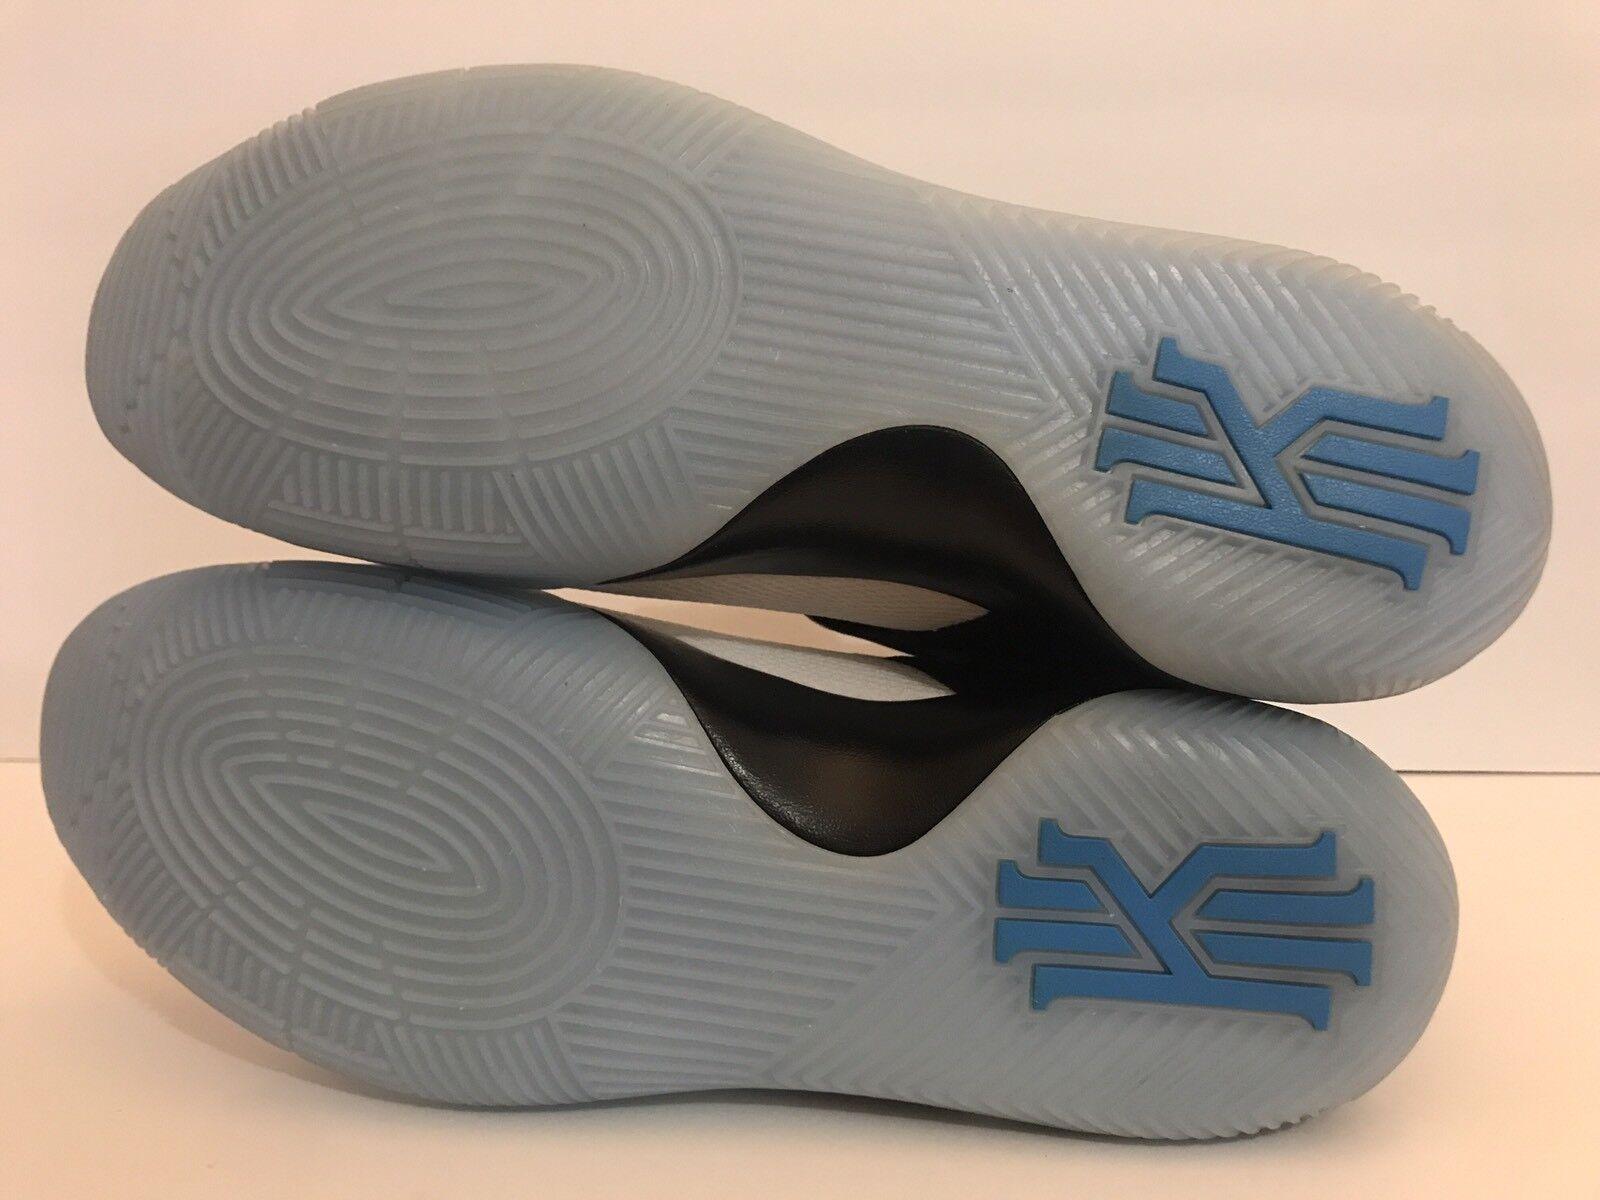 401576023c61 ... Nike Nike Nike Kyrie Irving II Championship Parade Black QS 2819583-110  Sz 18 286b2c ...